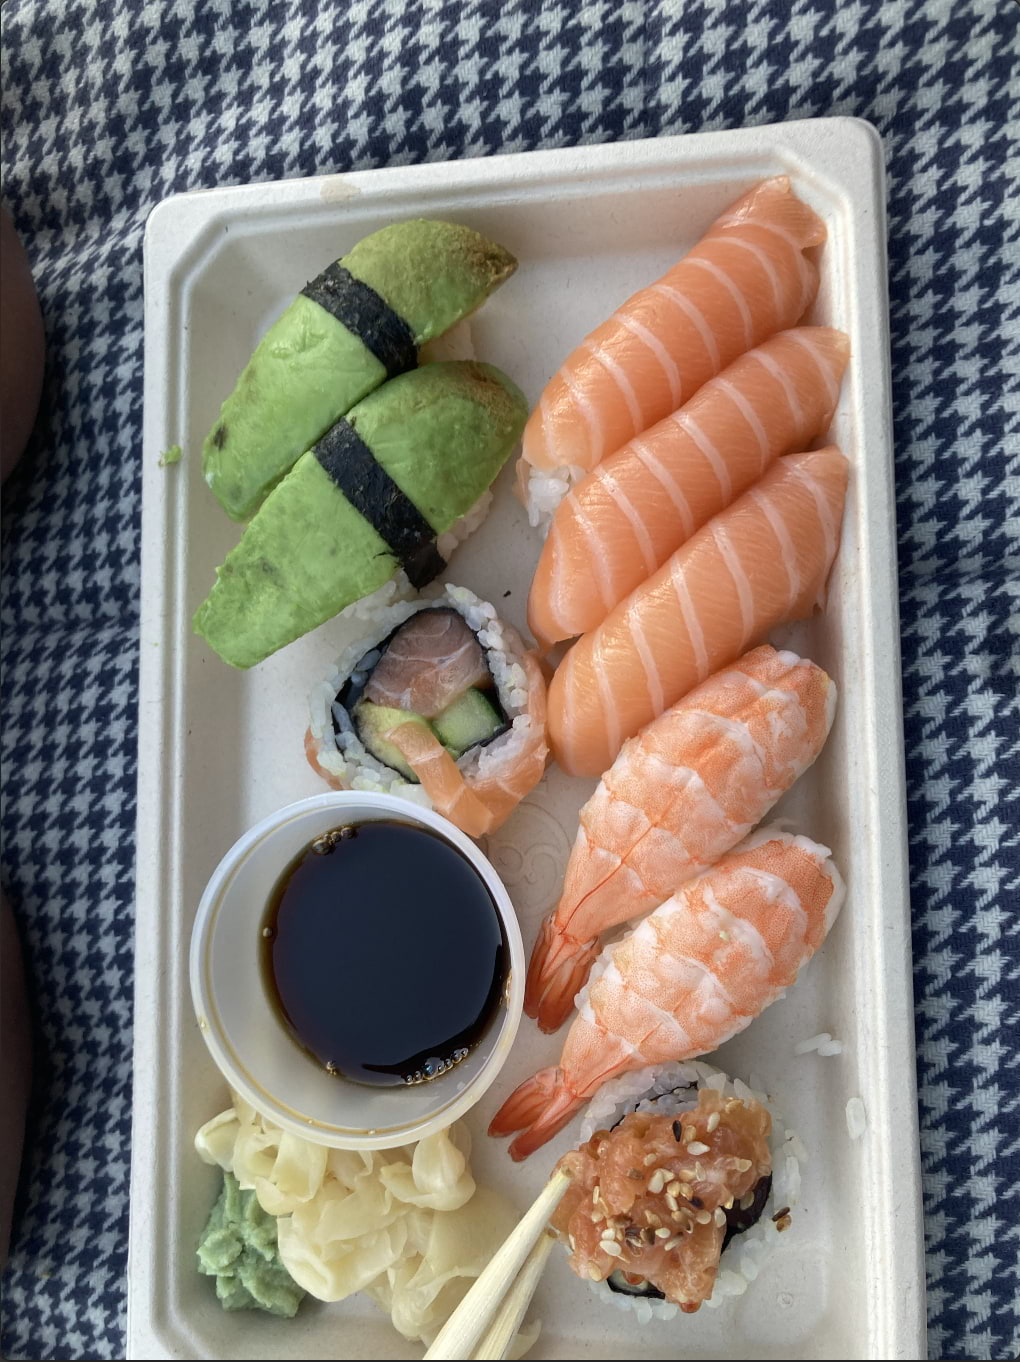 Liten sushi 9-bitars – Bild från Saya Sushi Östermalm av Jessica K.